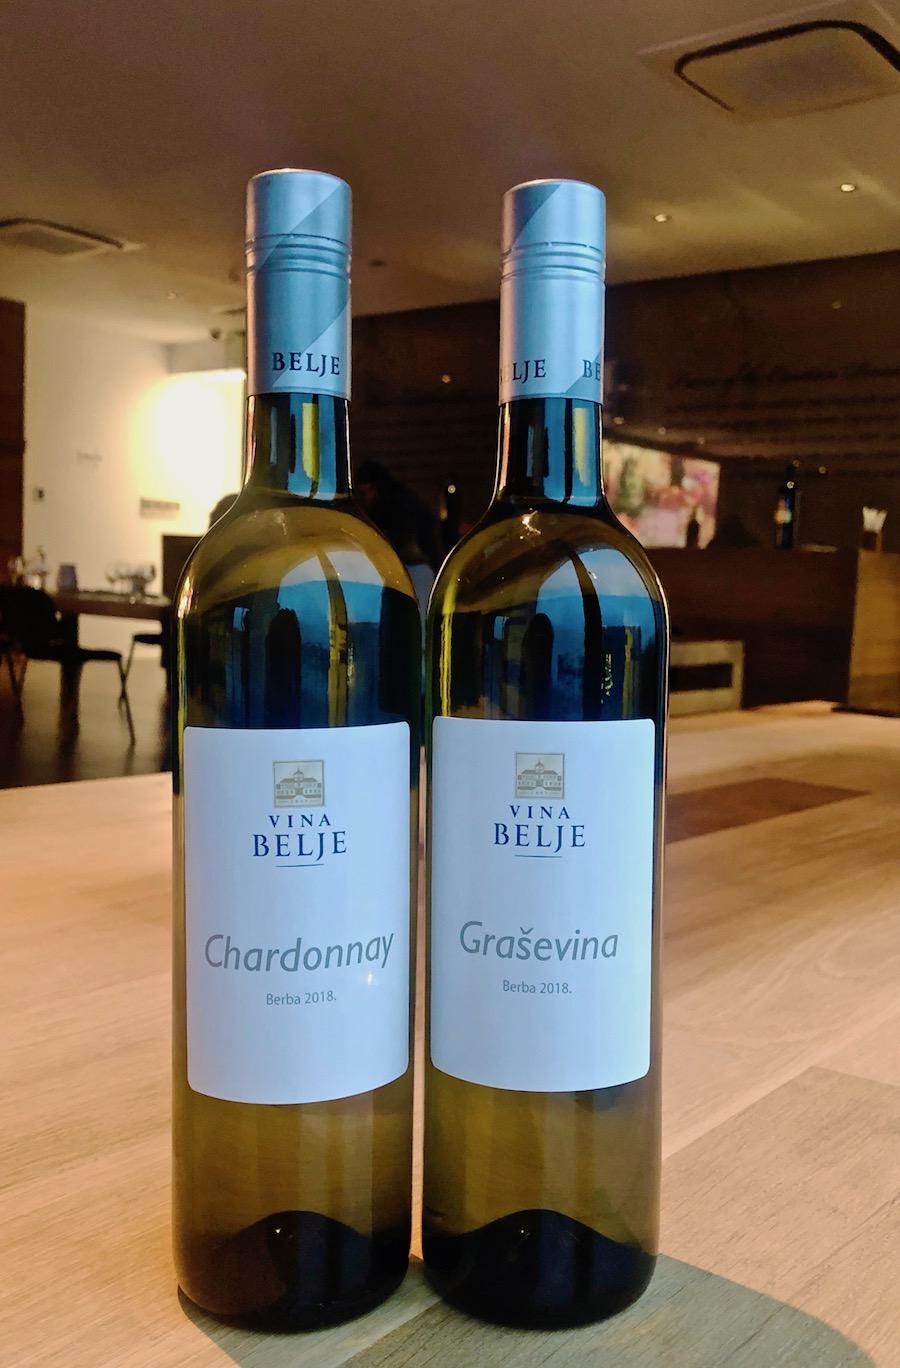 belje-tasting-grasevina-chardonnay